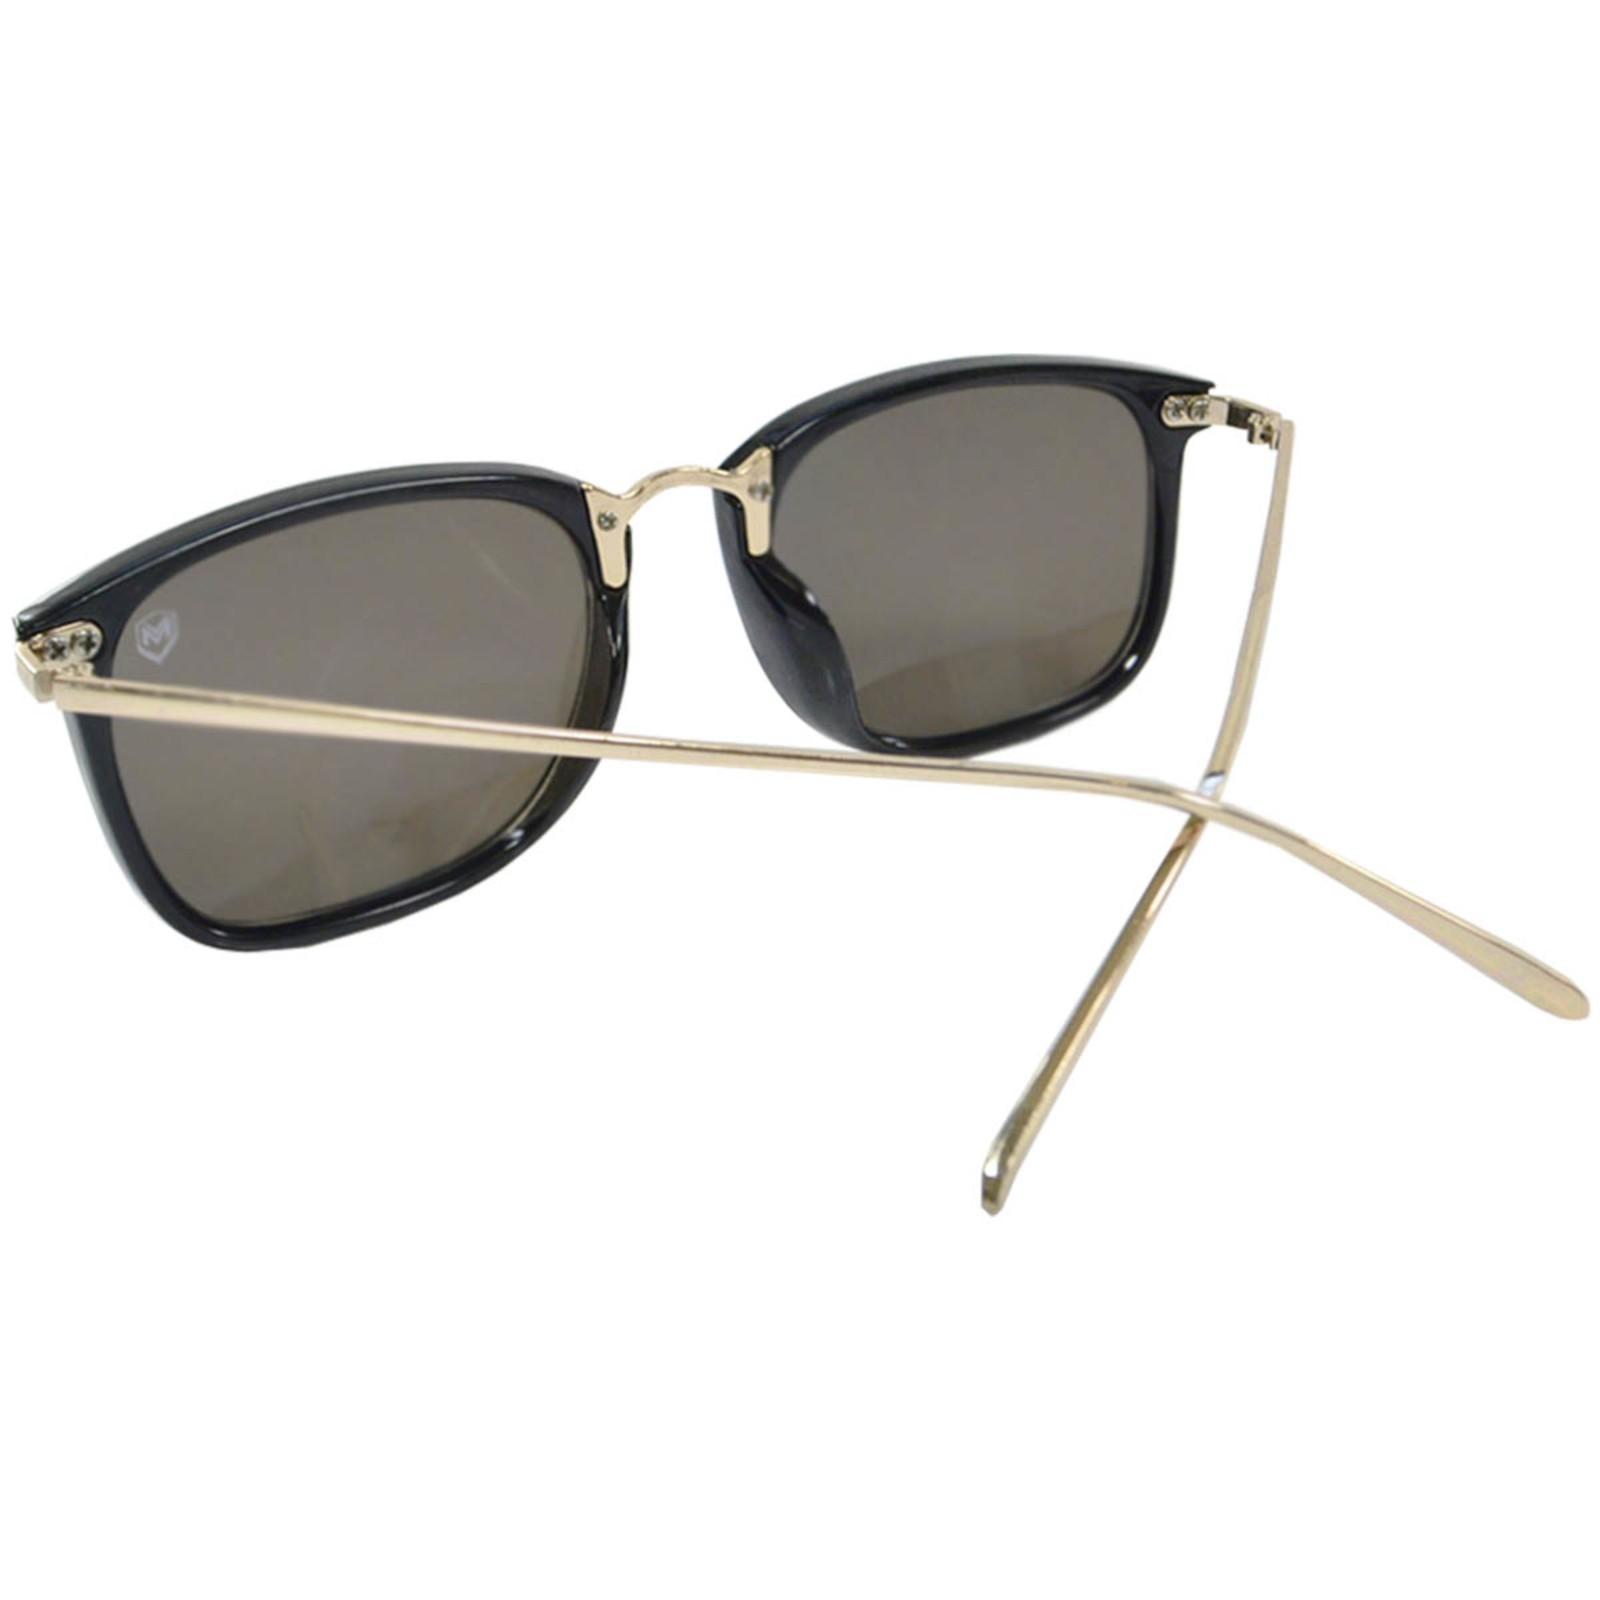 Óculos De Sol Mackage Unissex Acetato/Metal Retangular - Preto